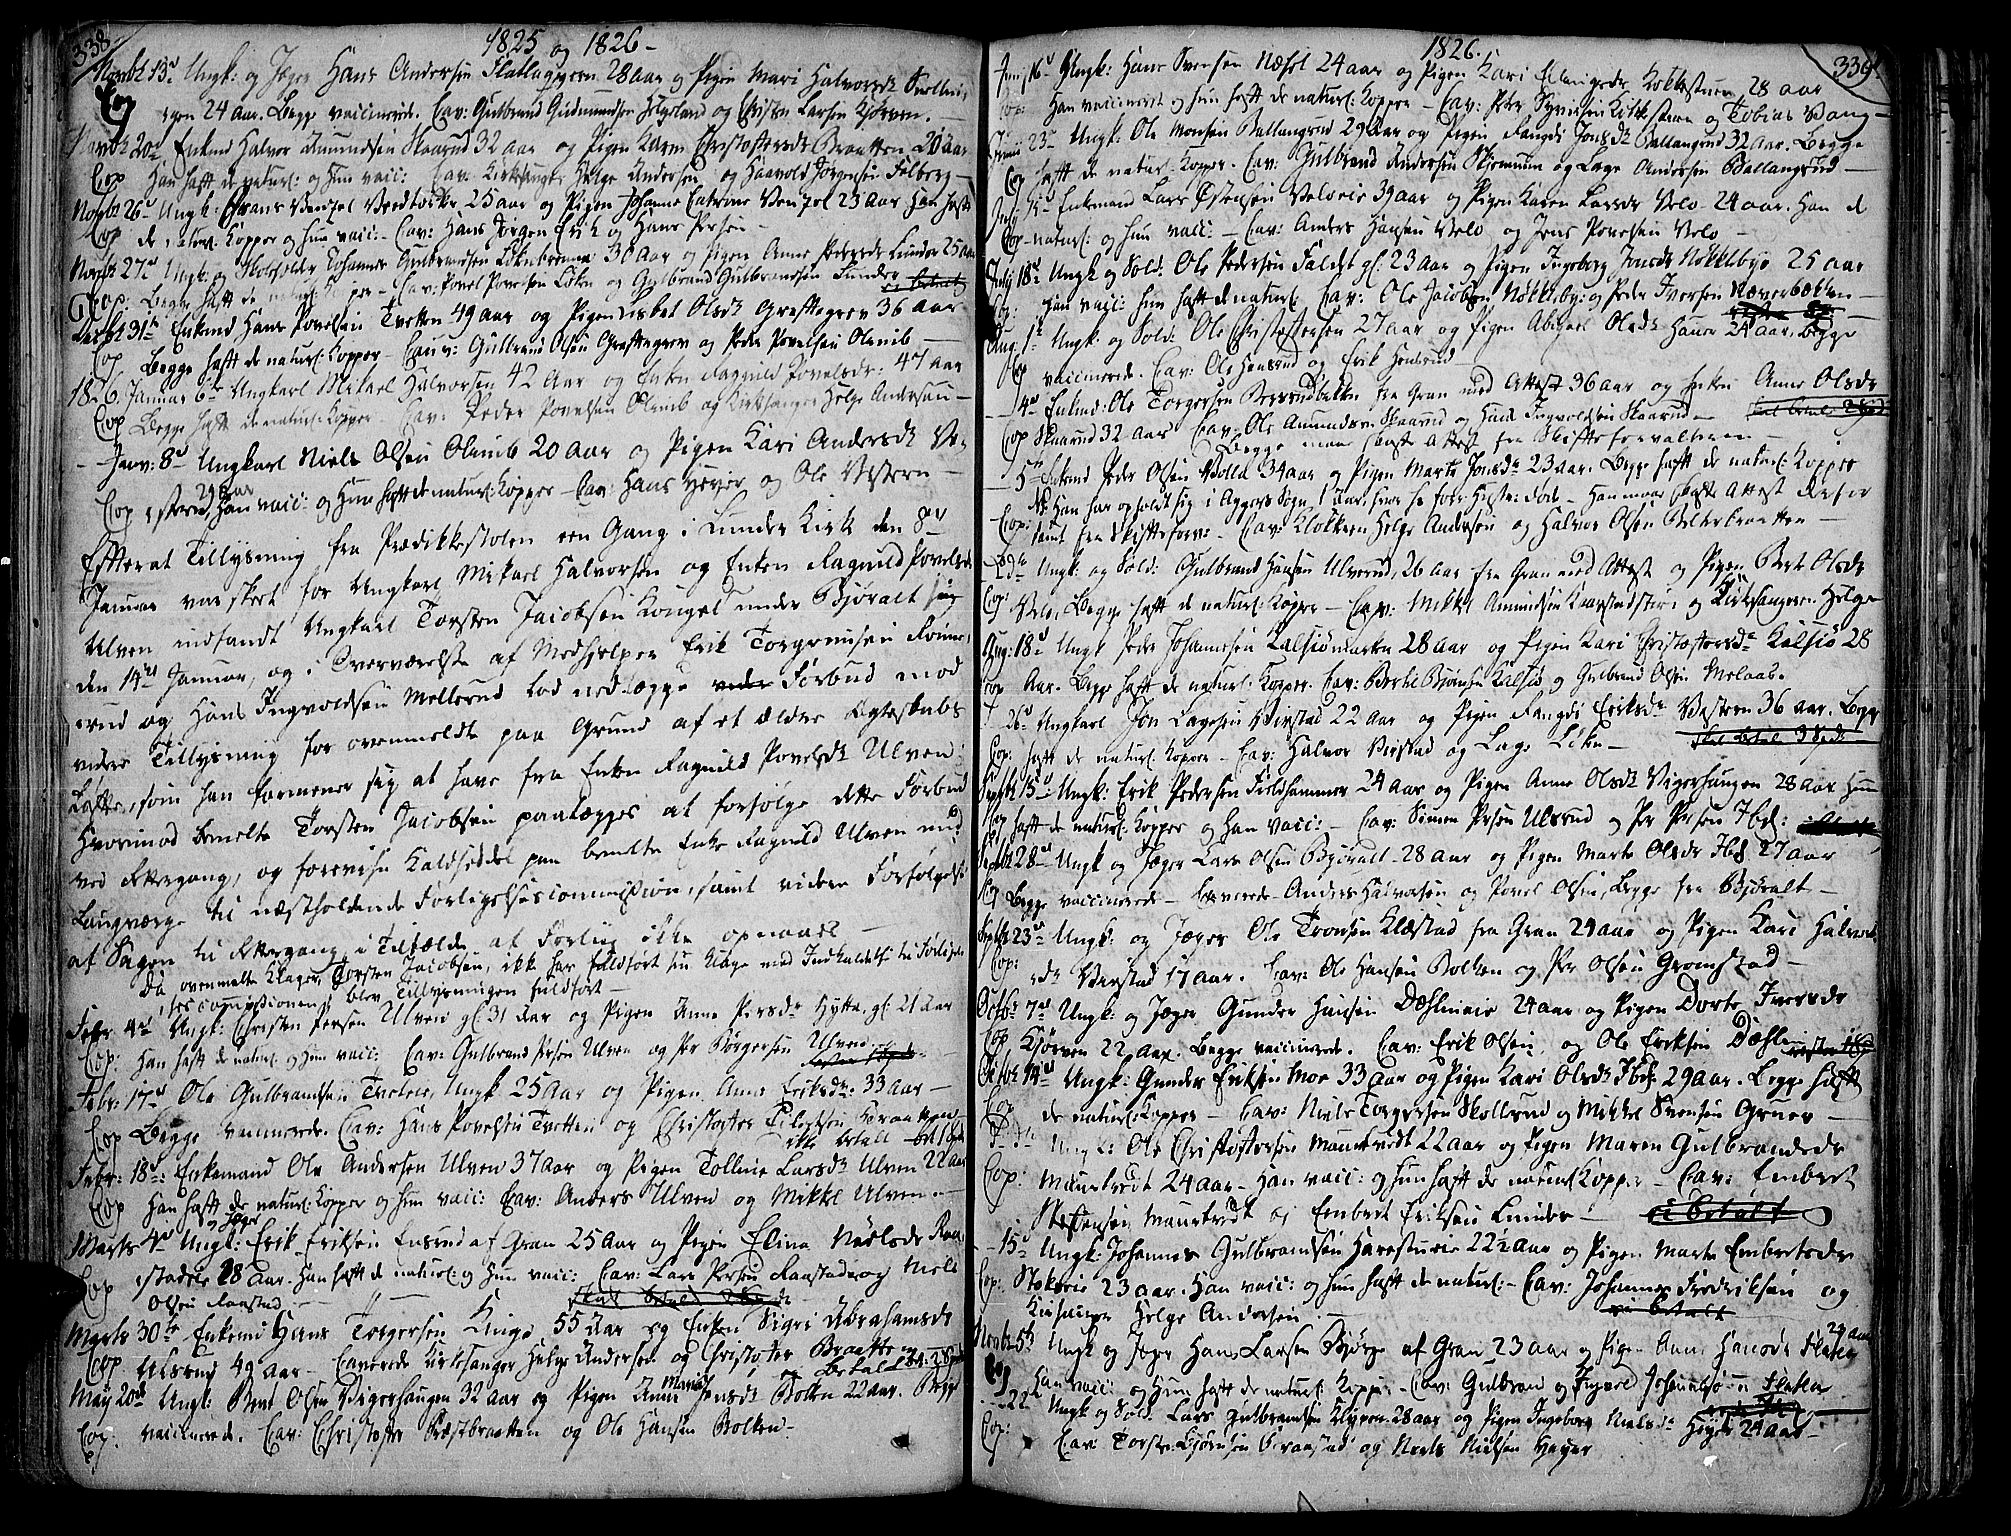 SAH, Jevnaker prestekontor, Ministerialbok nr. 4, 1800-1861, s. 338-339